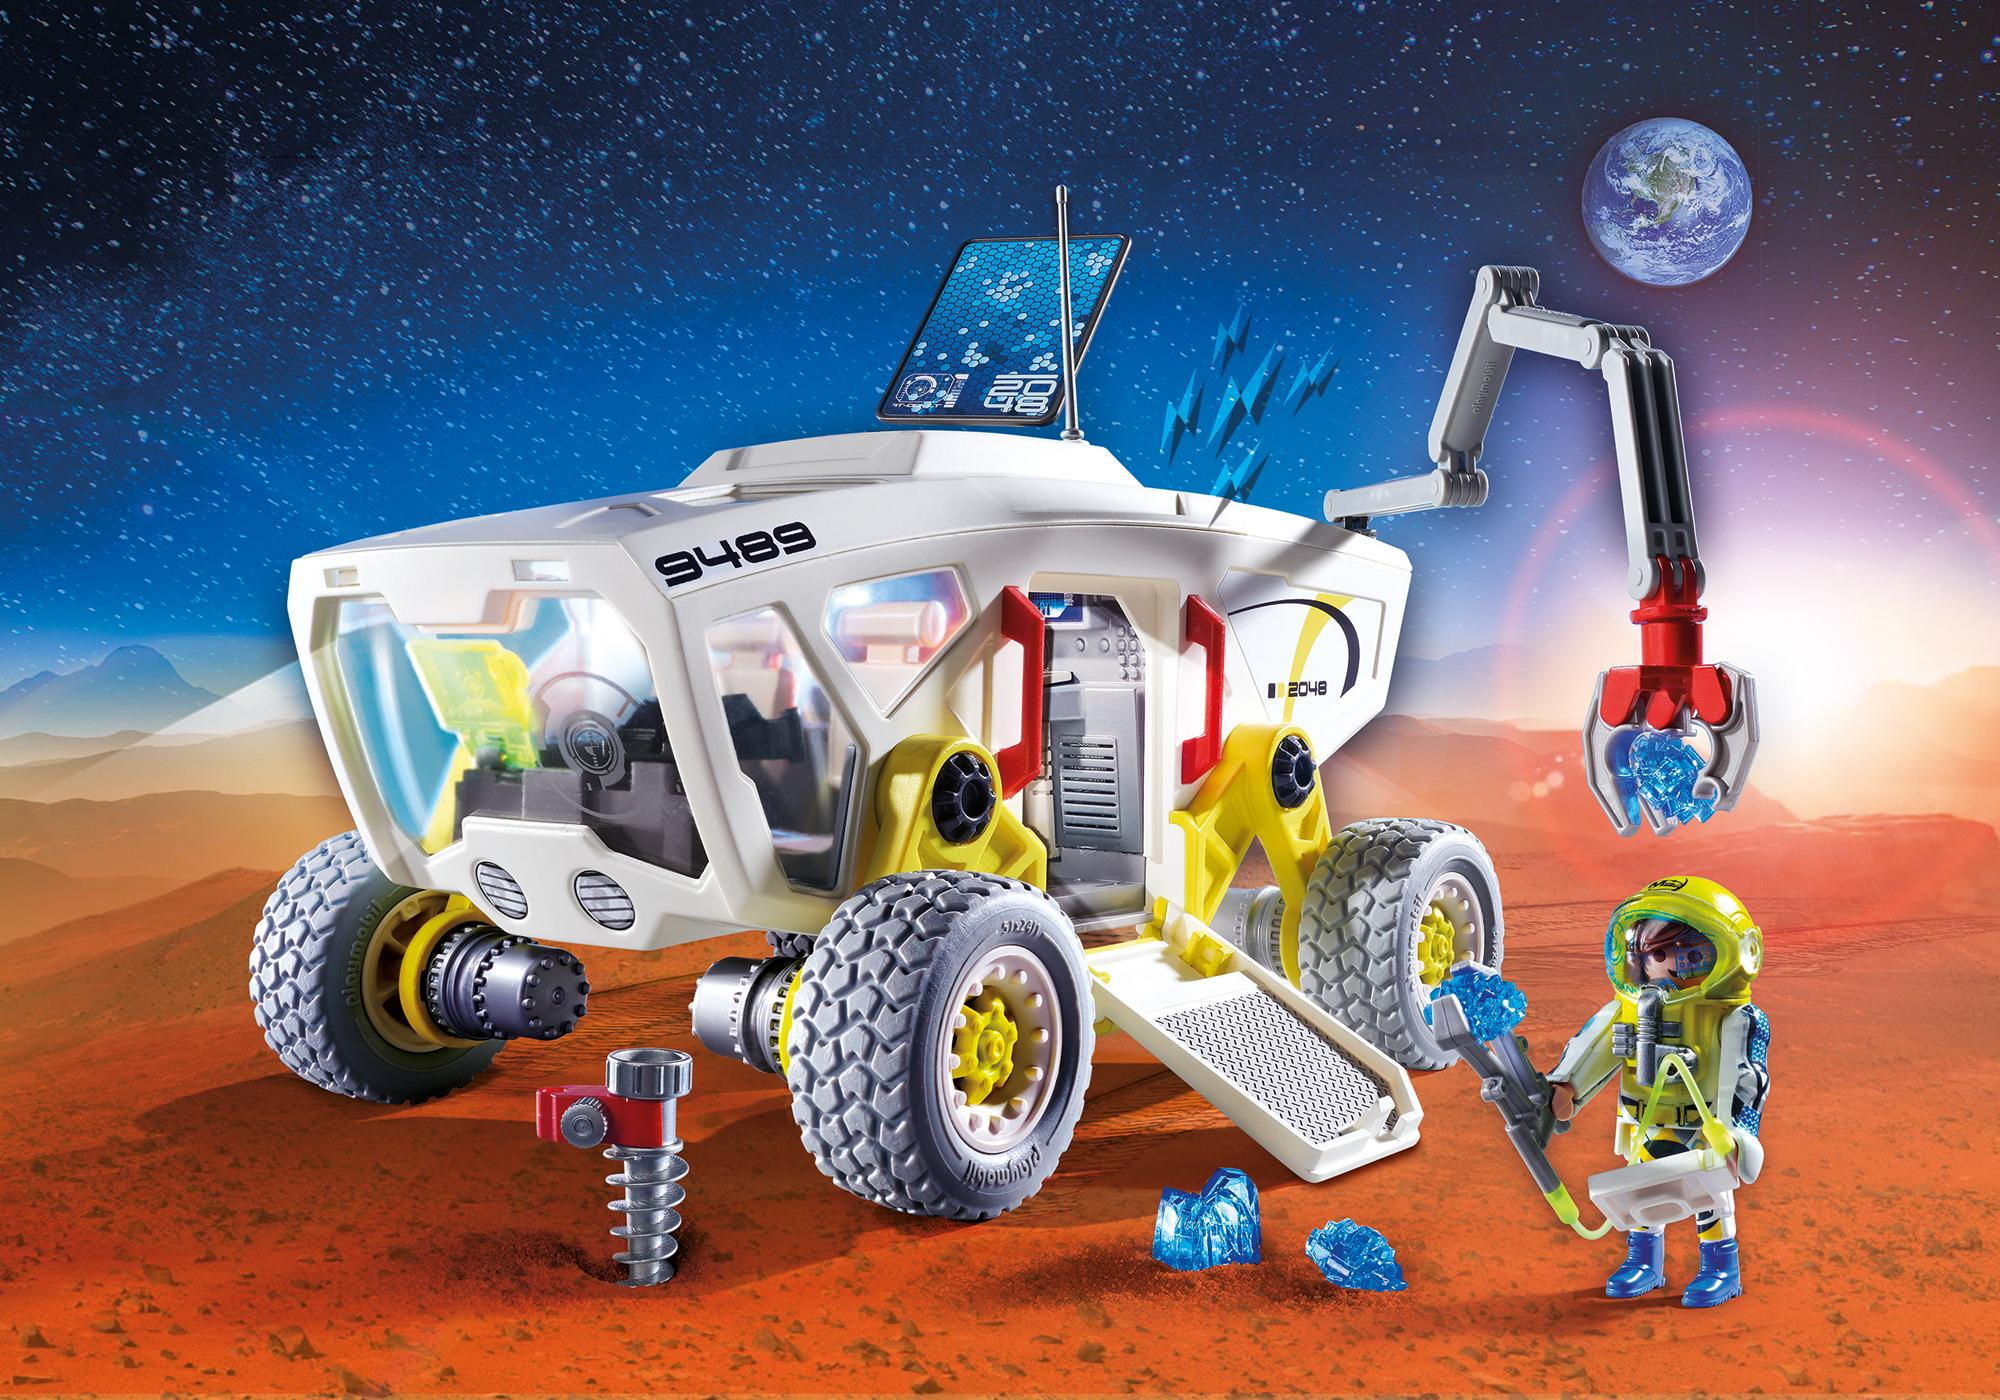 9489_product_detail/Διαστημικό όχημα εξερεύνησης